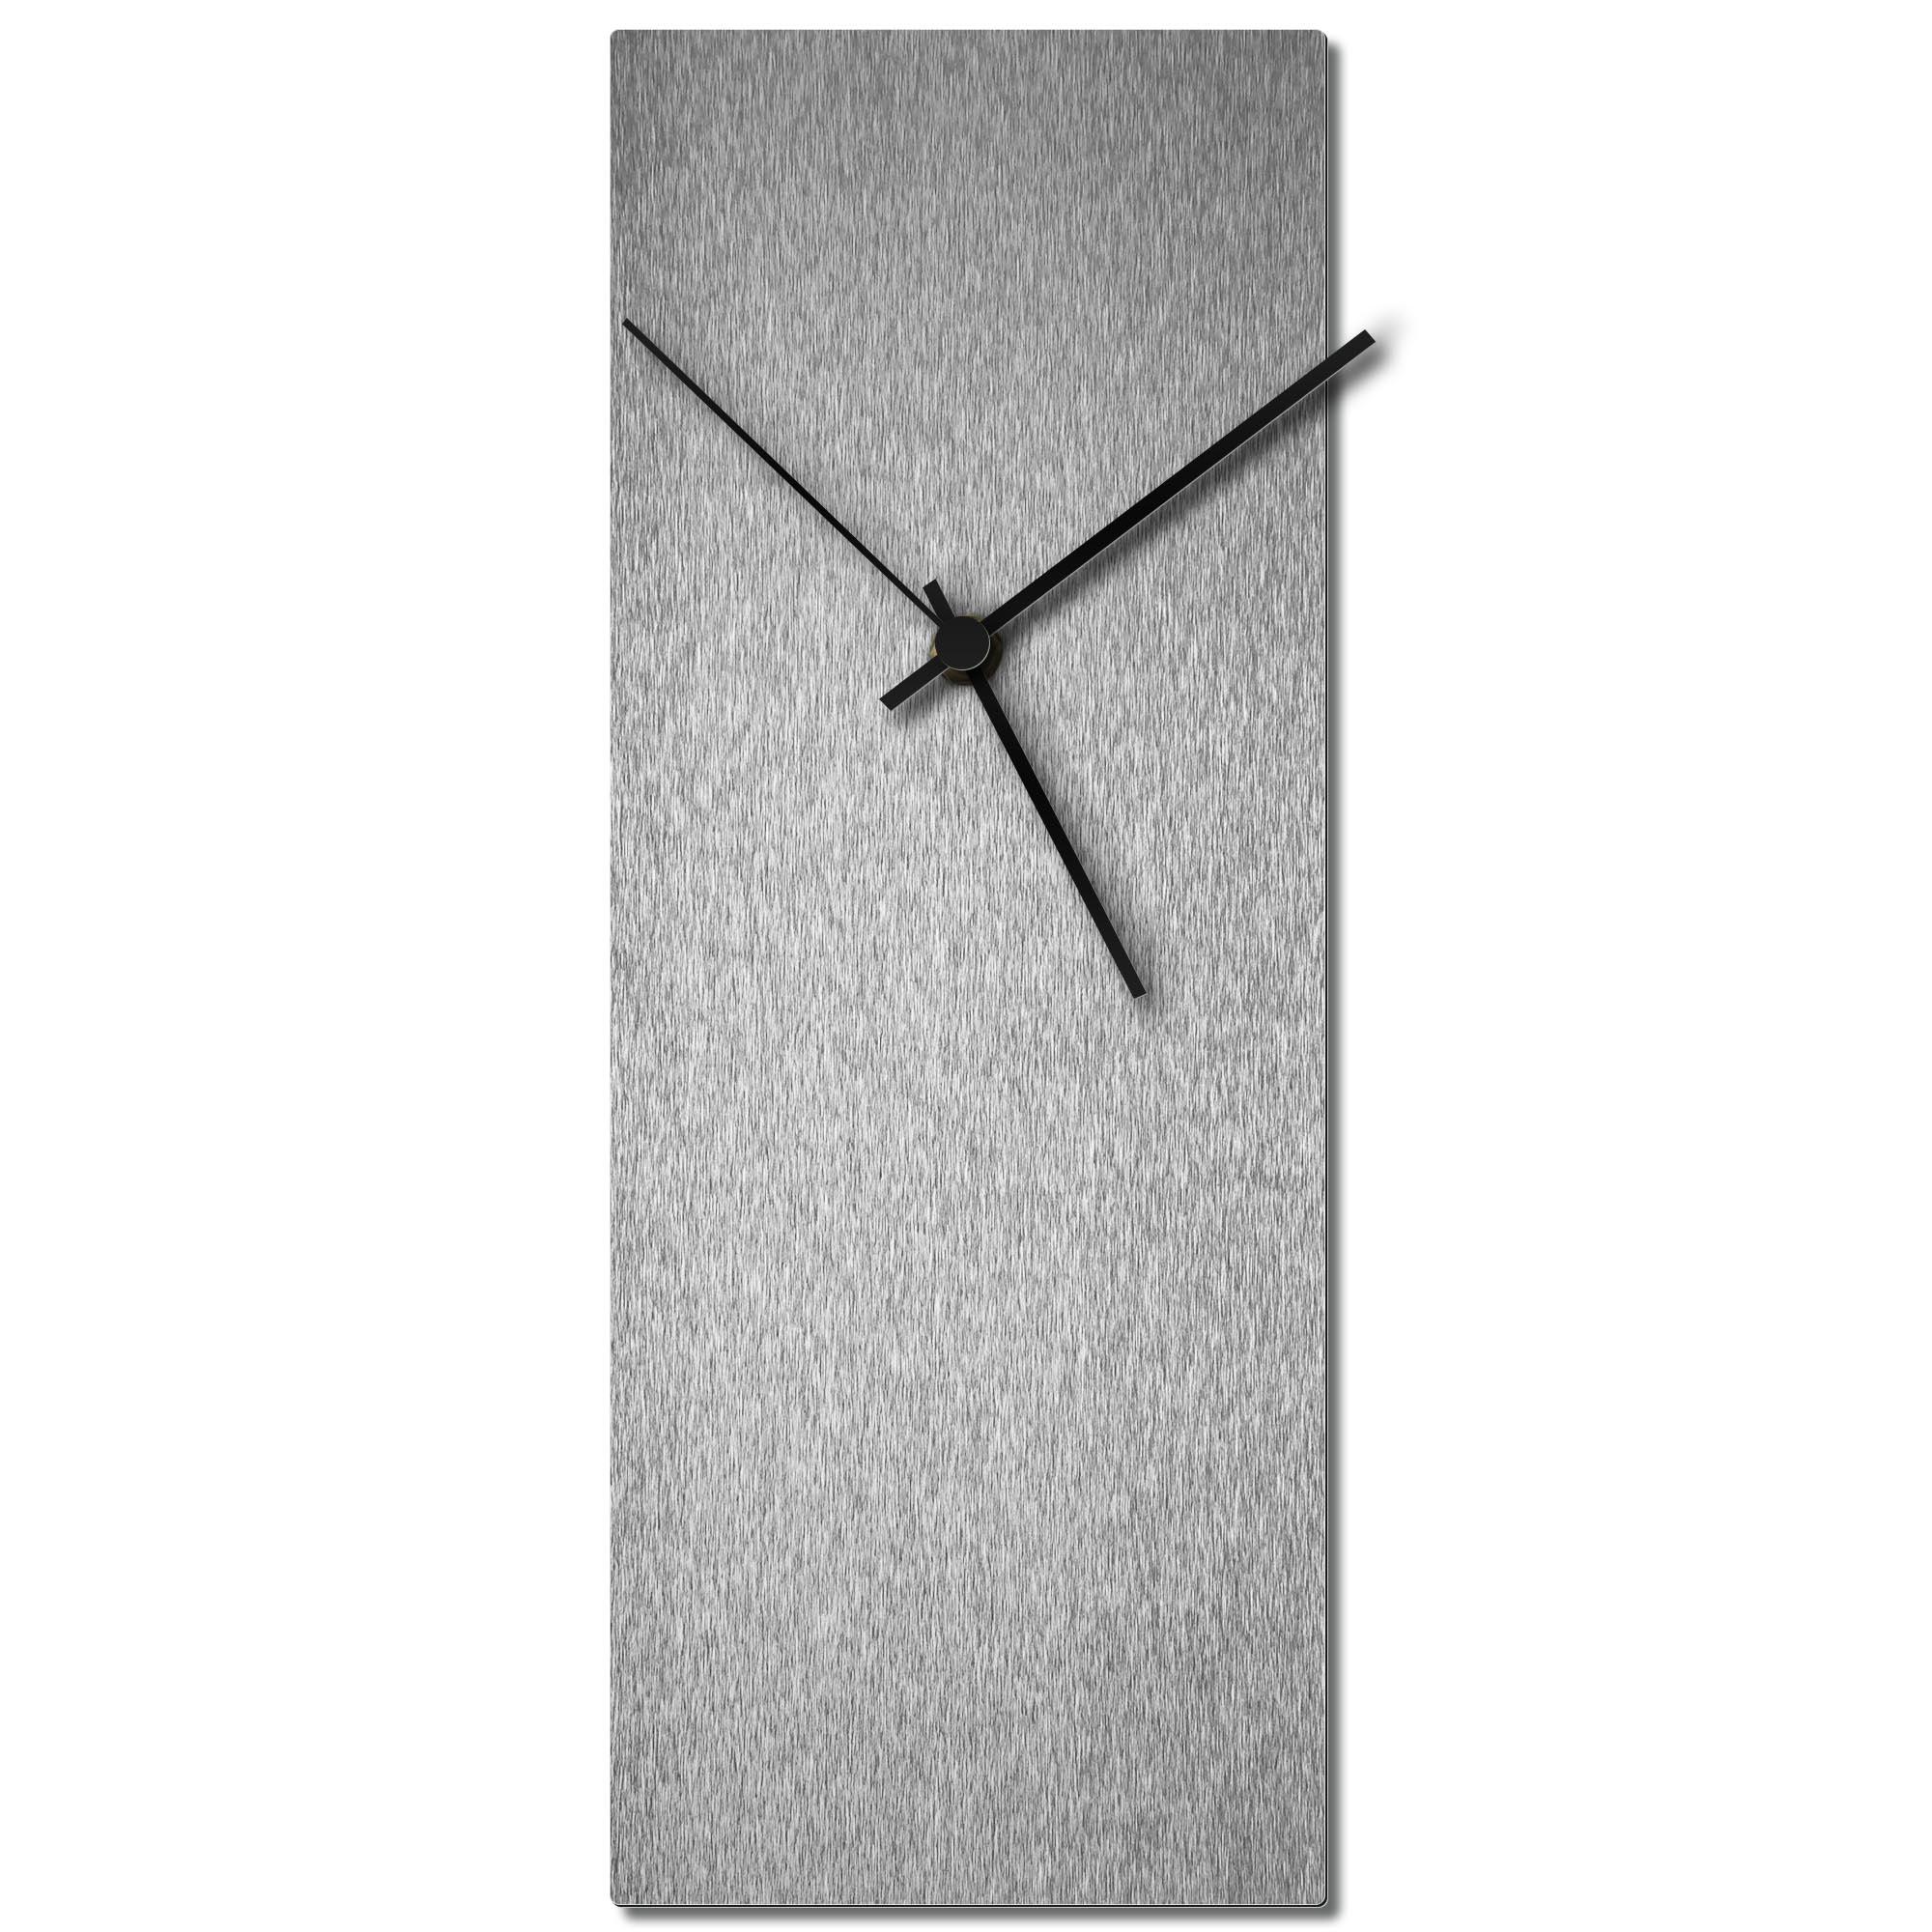 Adam Schwoeppe 'Silversmith Clock Large Black' Midcentury Modern Style Wall Clock